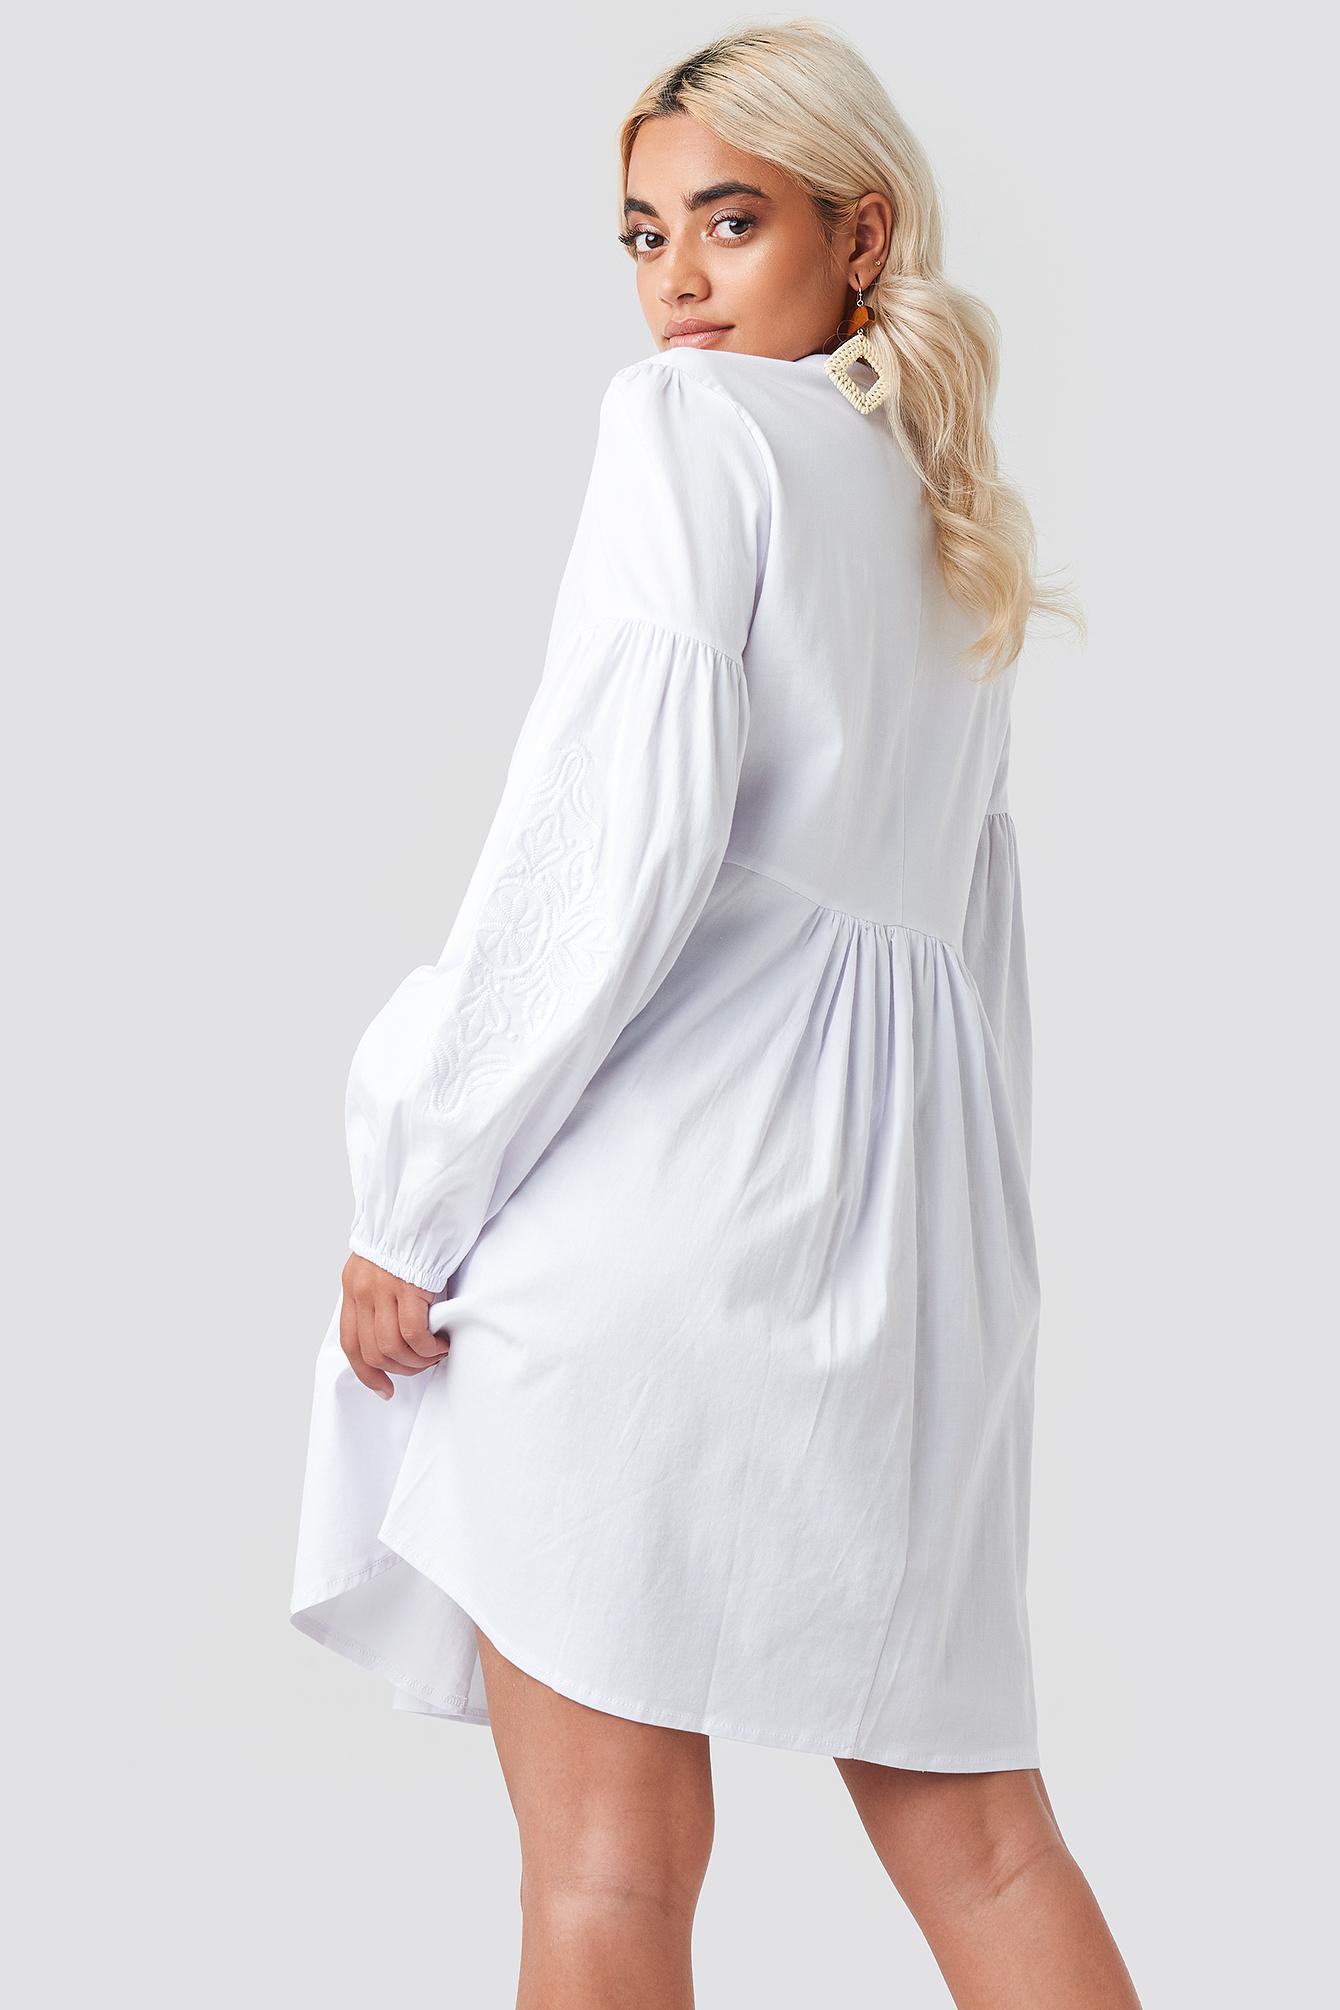 Yol Embroidered Mini Dress NA-KD.COM